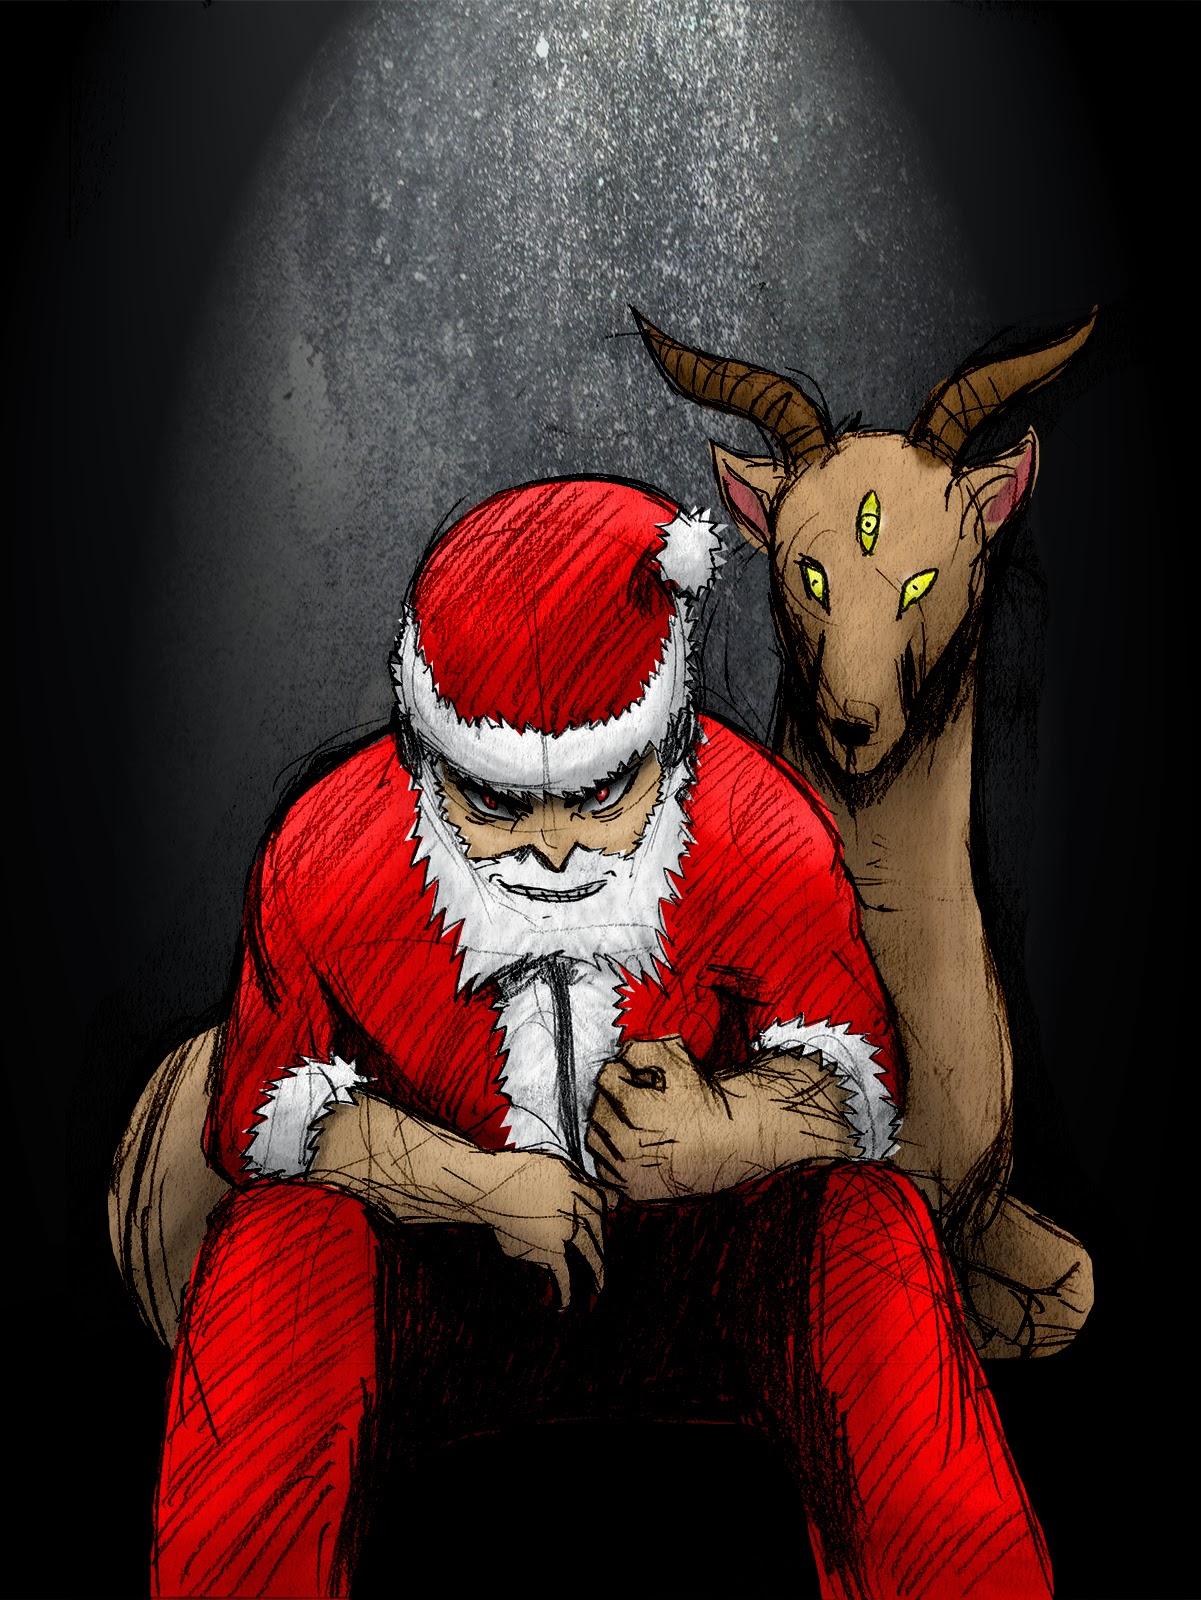 merry,christmas,xmas,eve,natal,selamat,2014